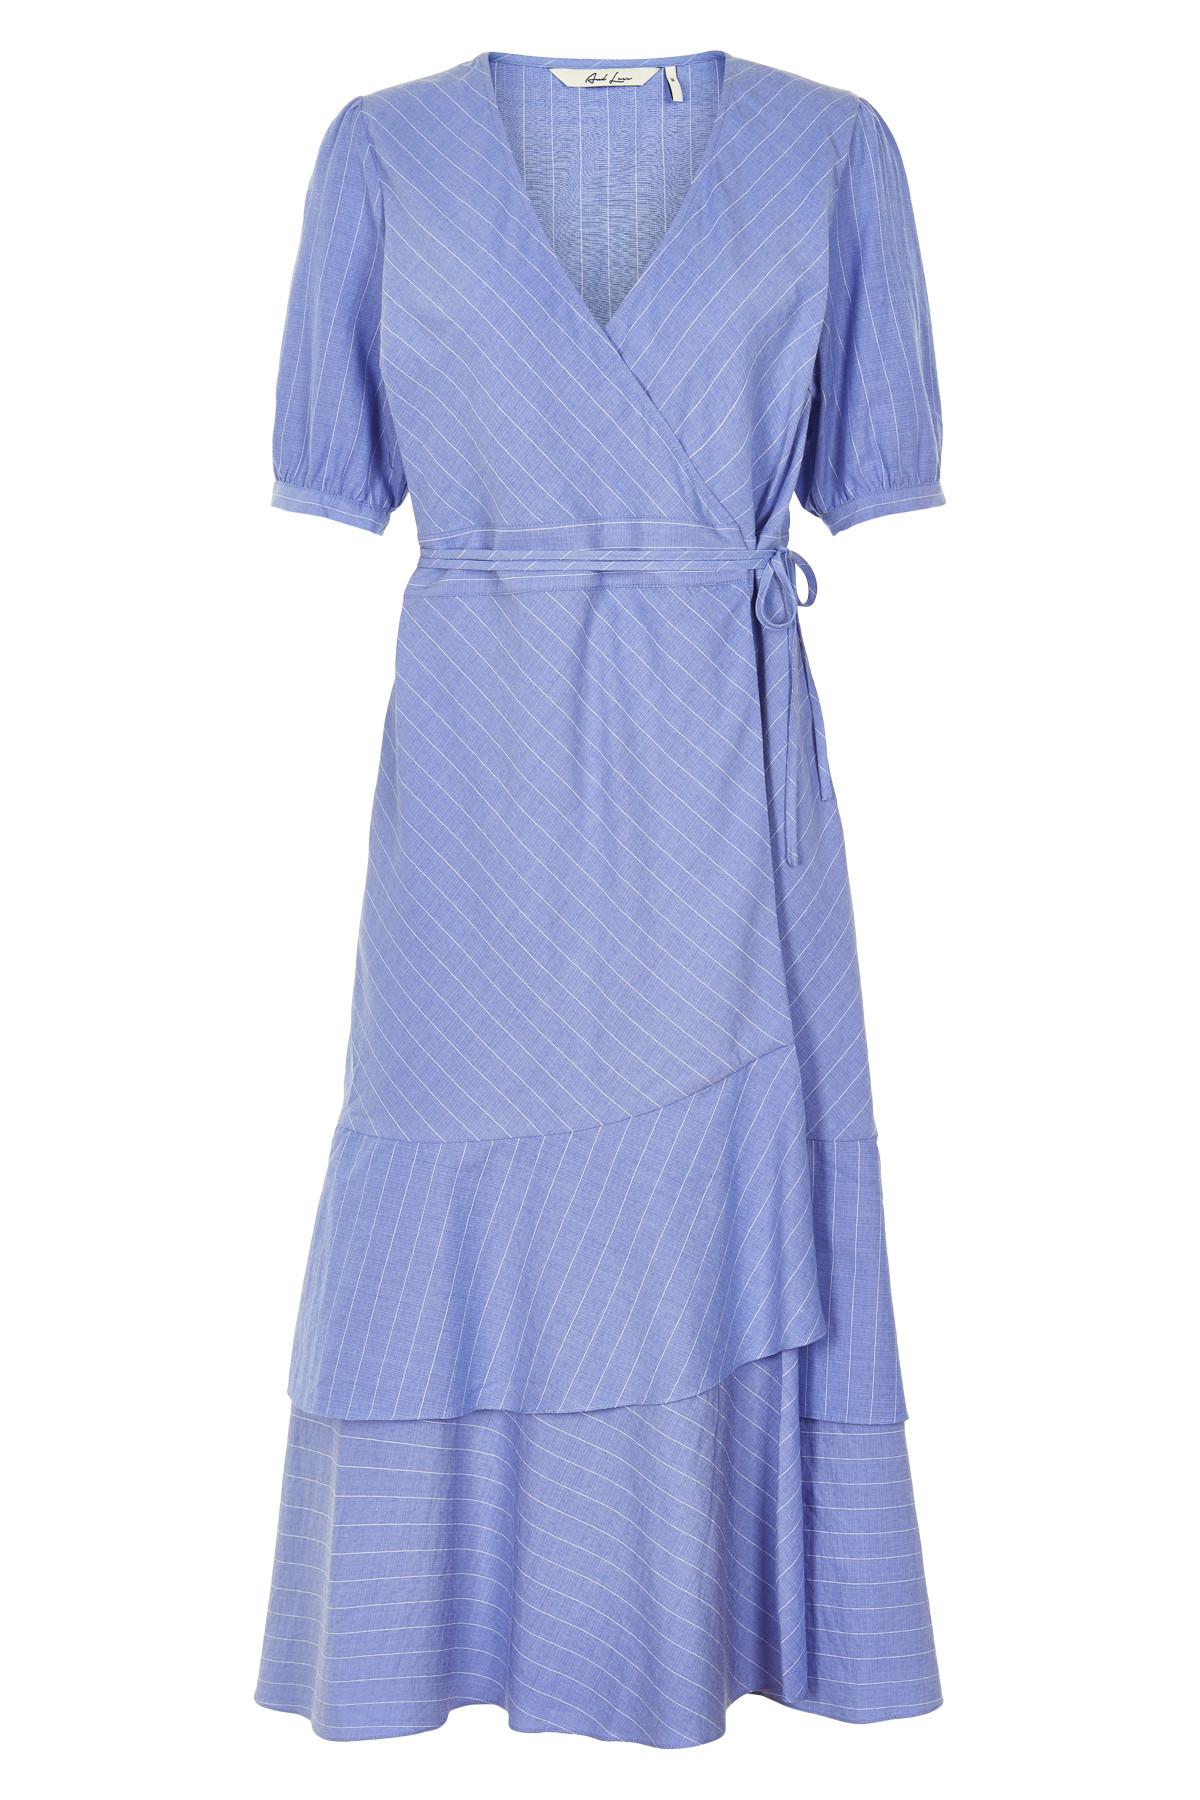 Image of   AND LESS PIOLAA KJOLE 5219803 (Blue Stripe, 42)